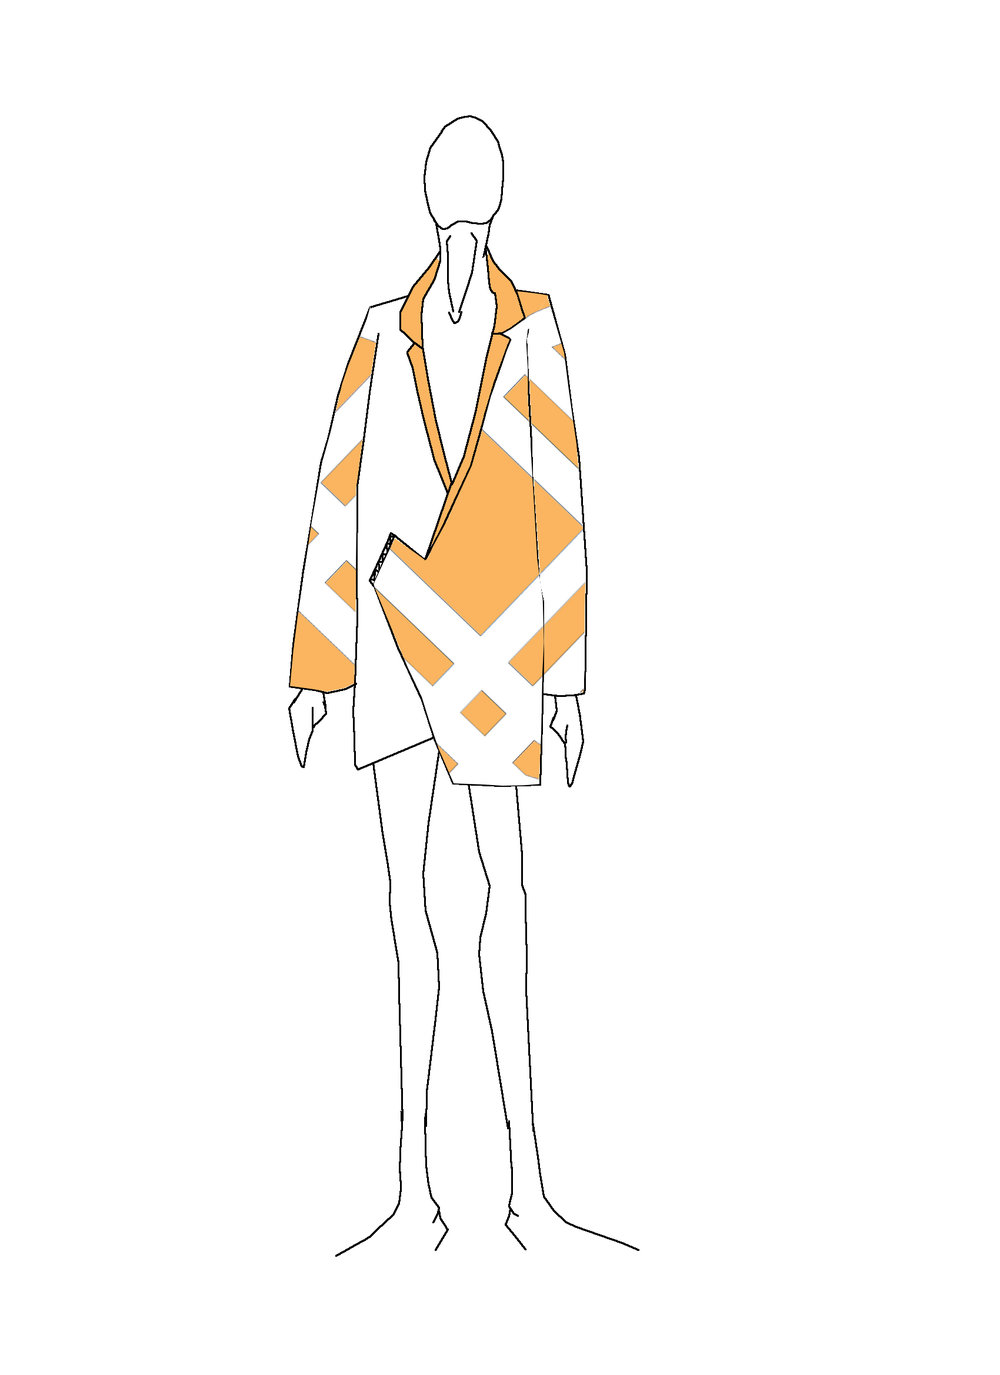 The Orange Slice Jacket   WOOD HOUSE Spring-Summer 2017